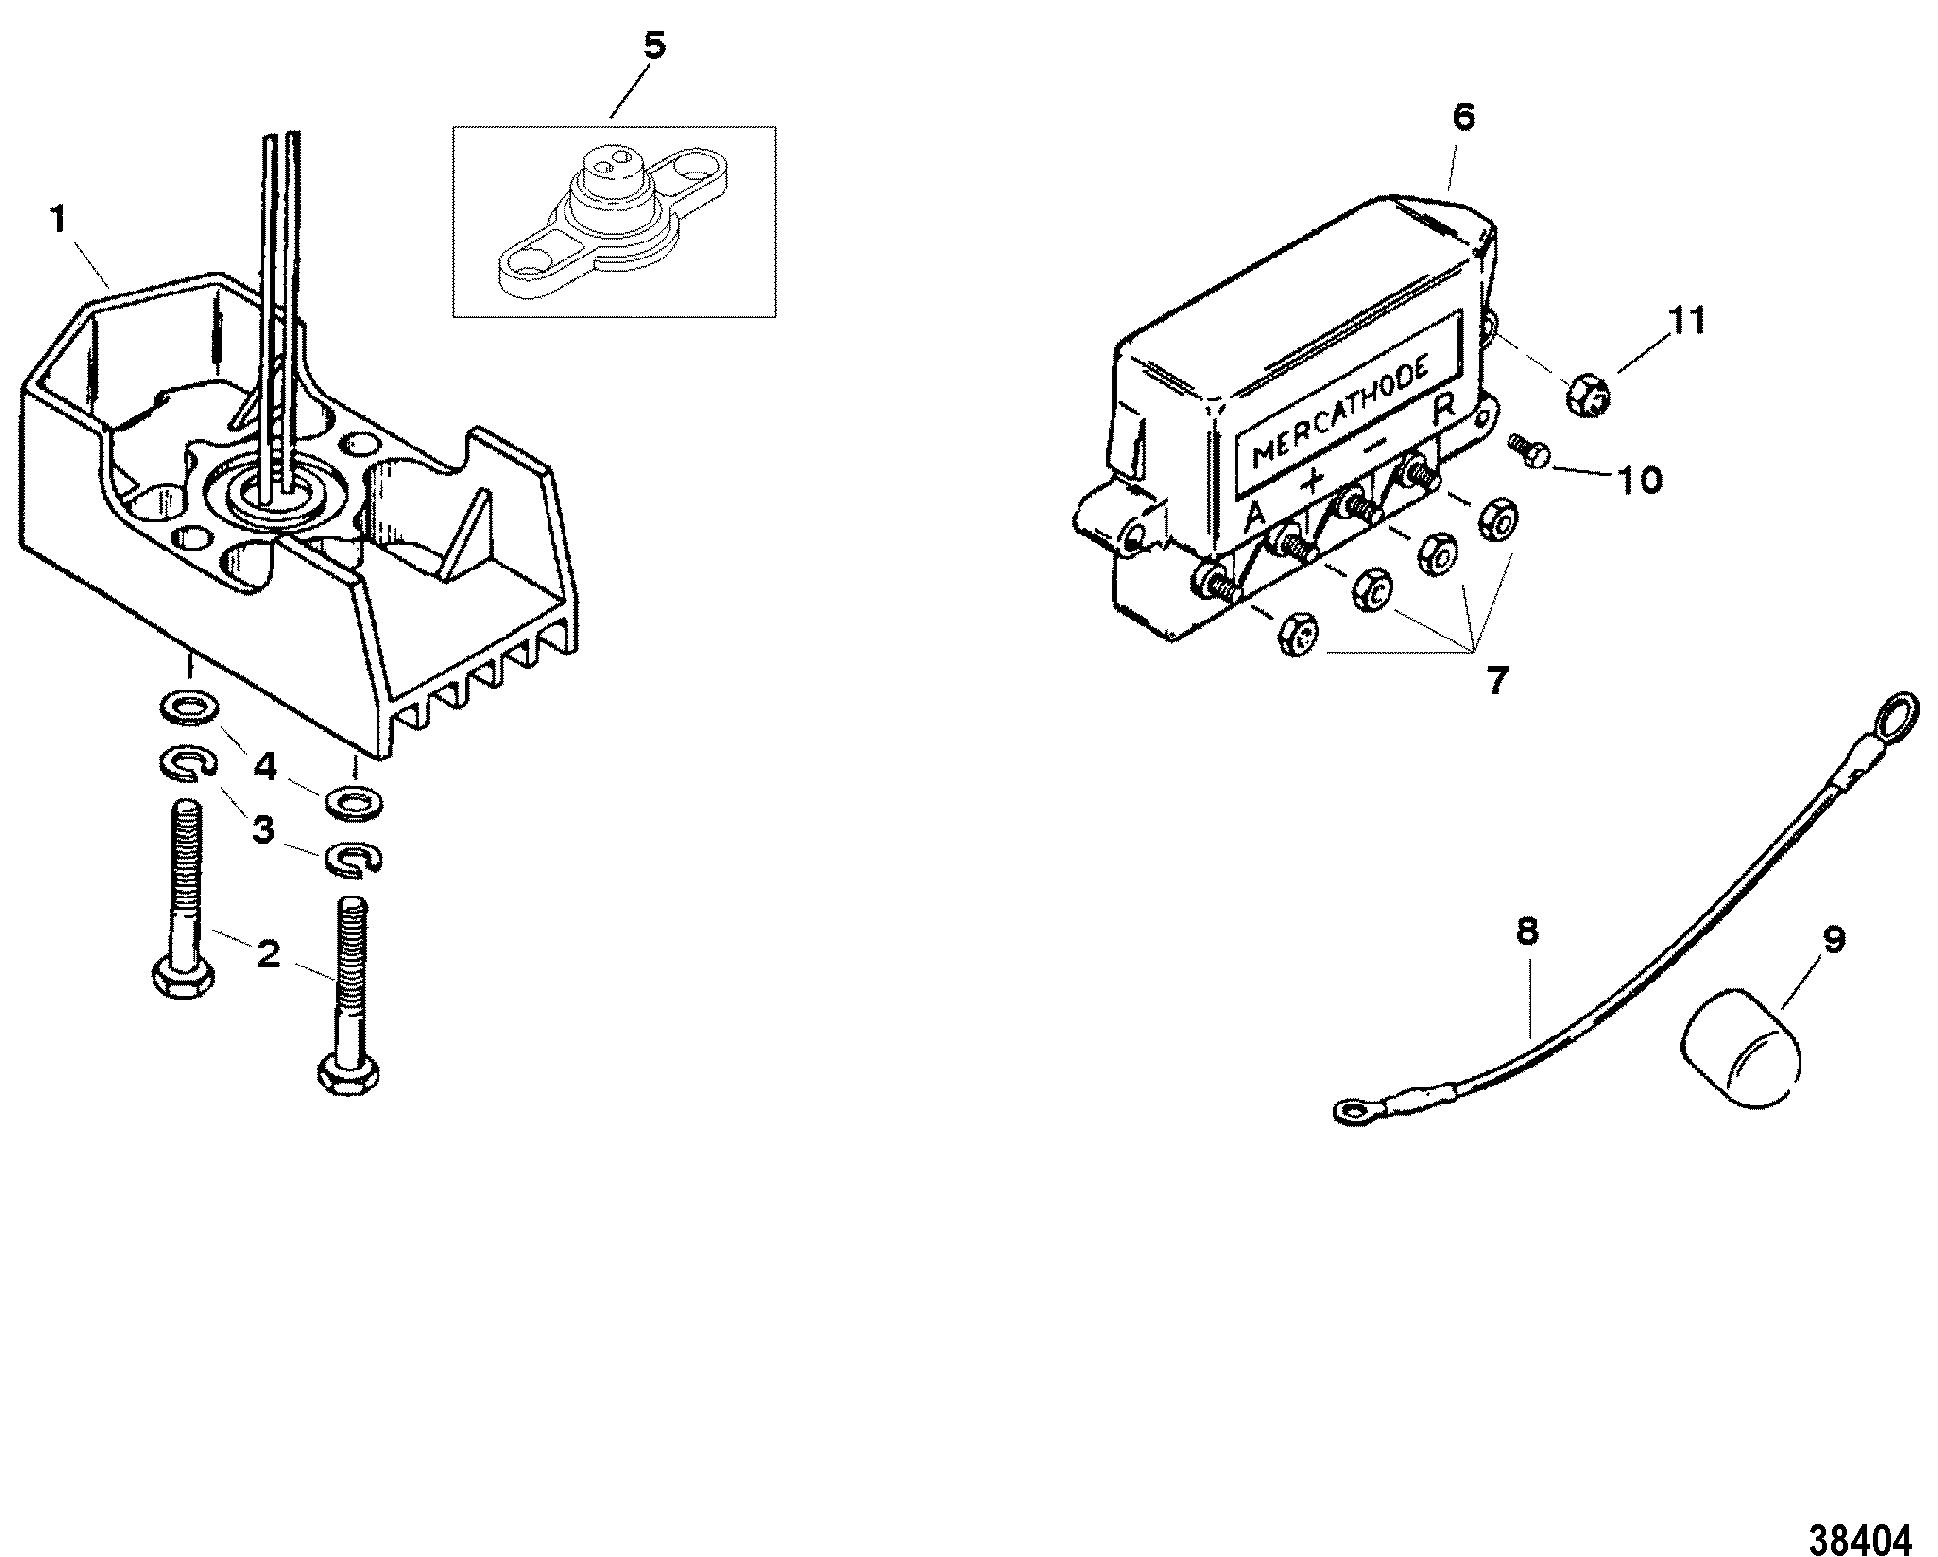 Pleasing Coil Wiring Diagram 1974 Mercruiser 888 302 Wiring Diagrams Wiring Digital Resources Funapmognl